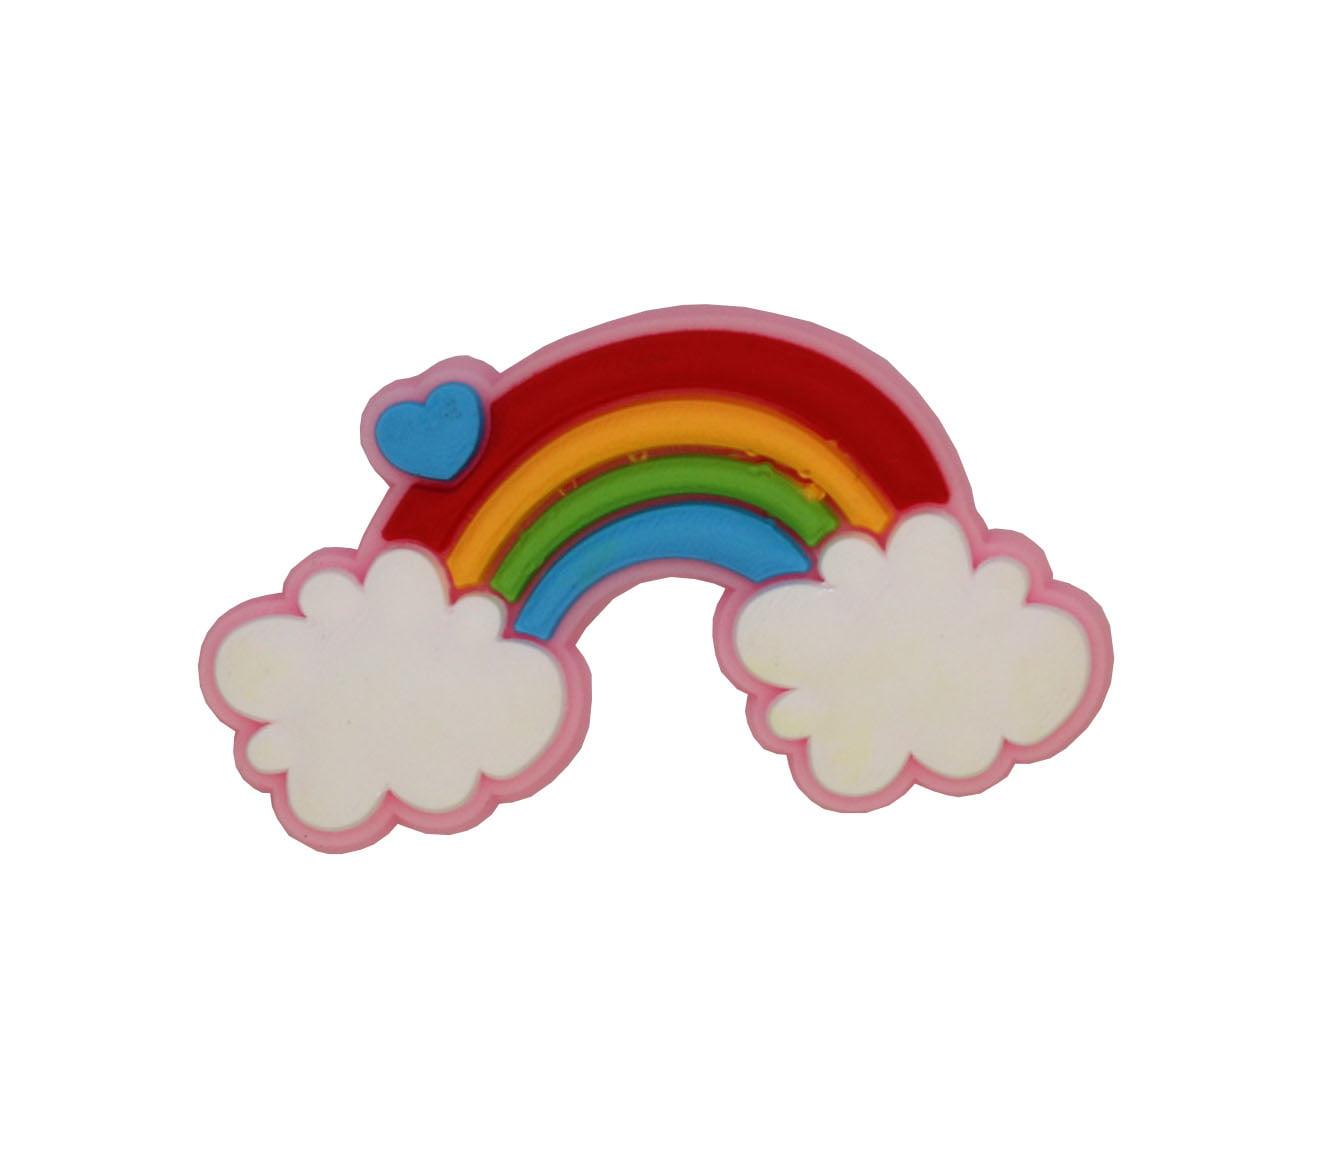 Aplique silicone - arco-íris colorido